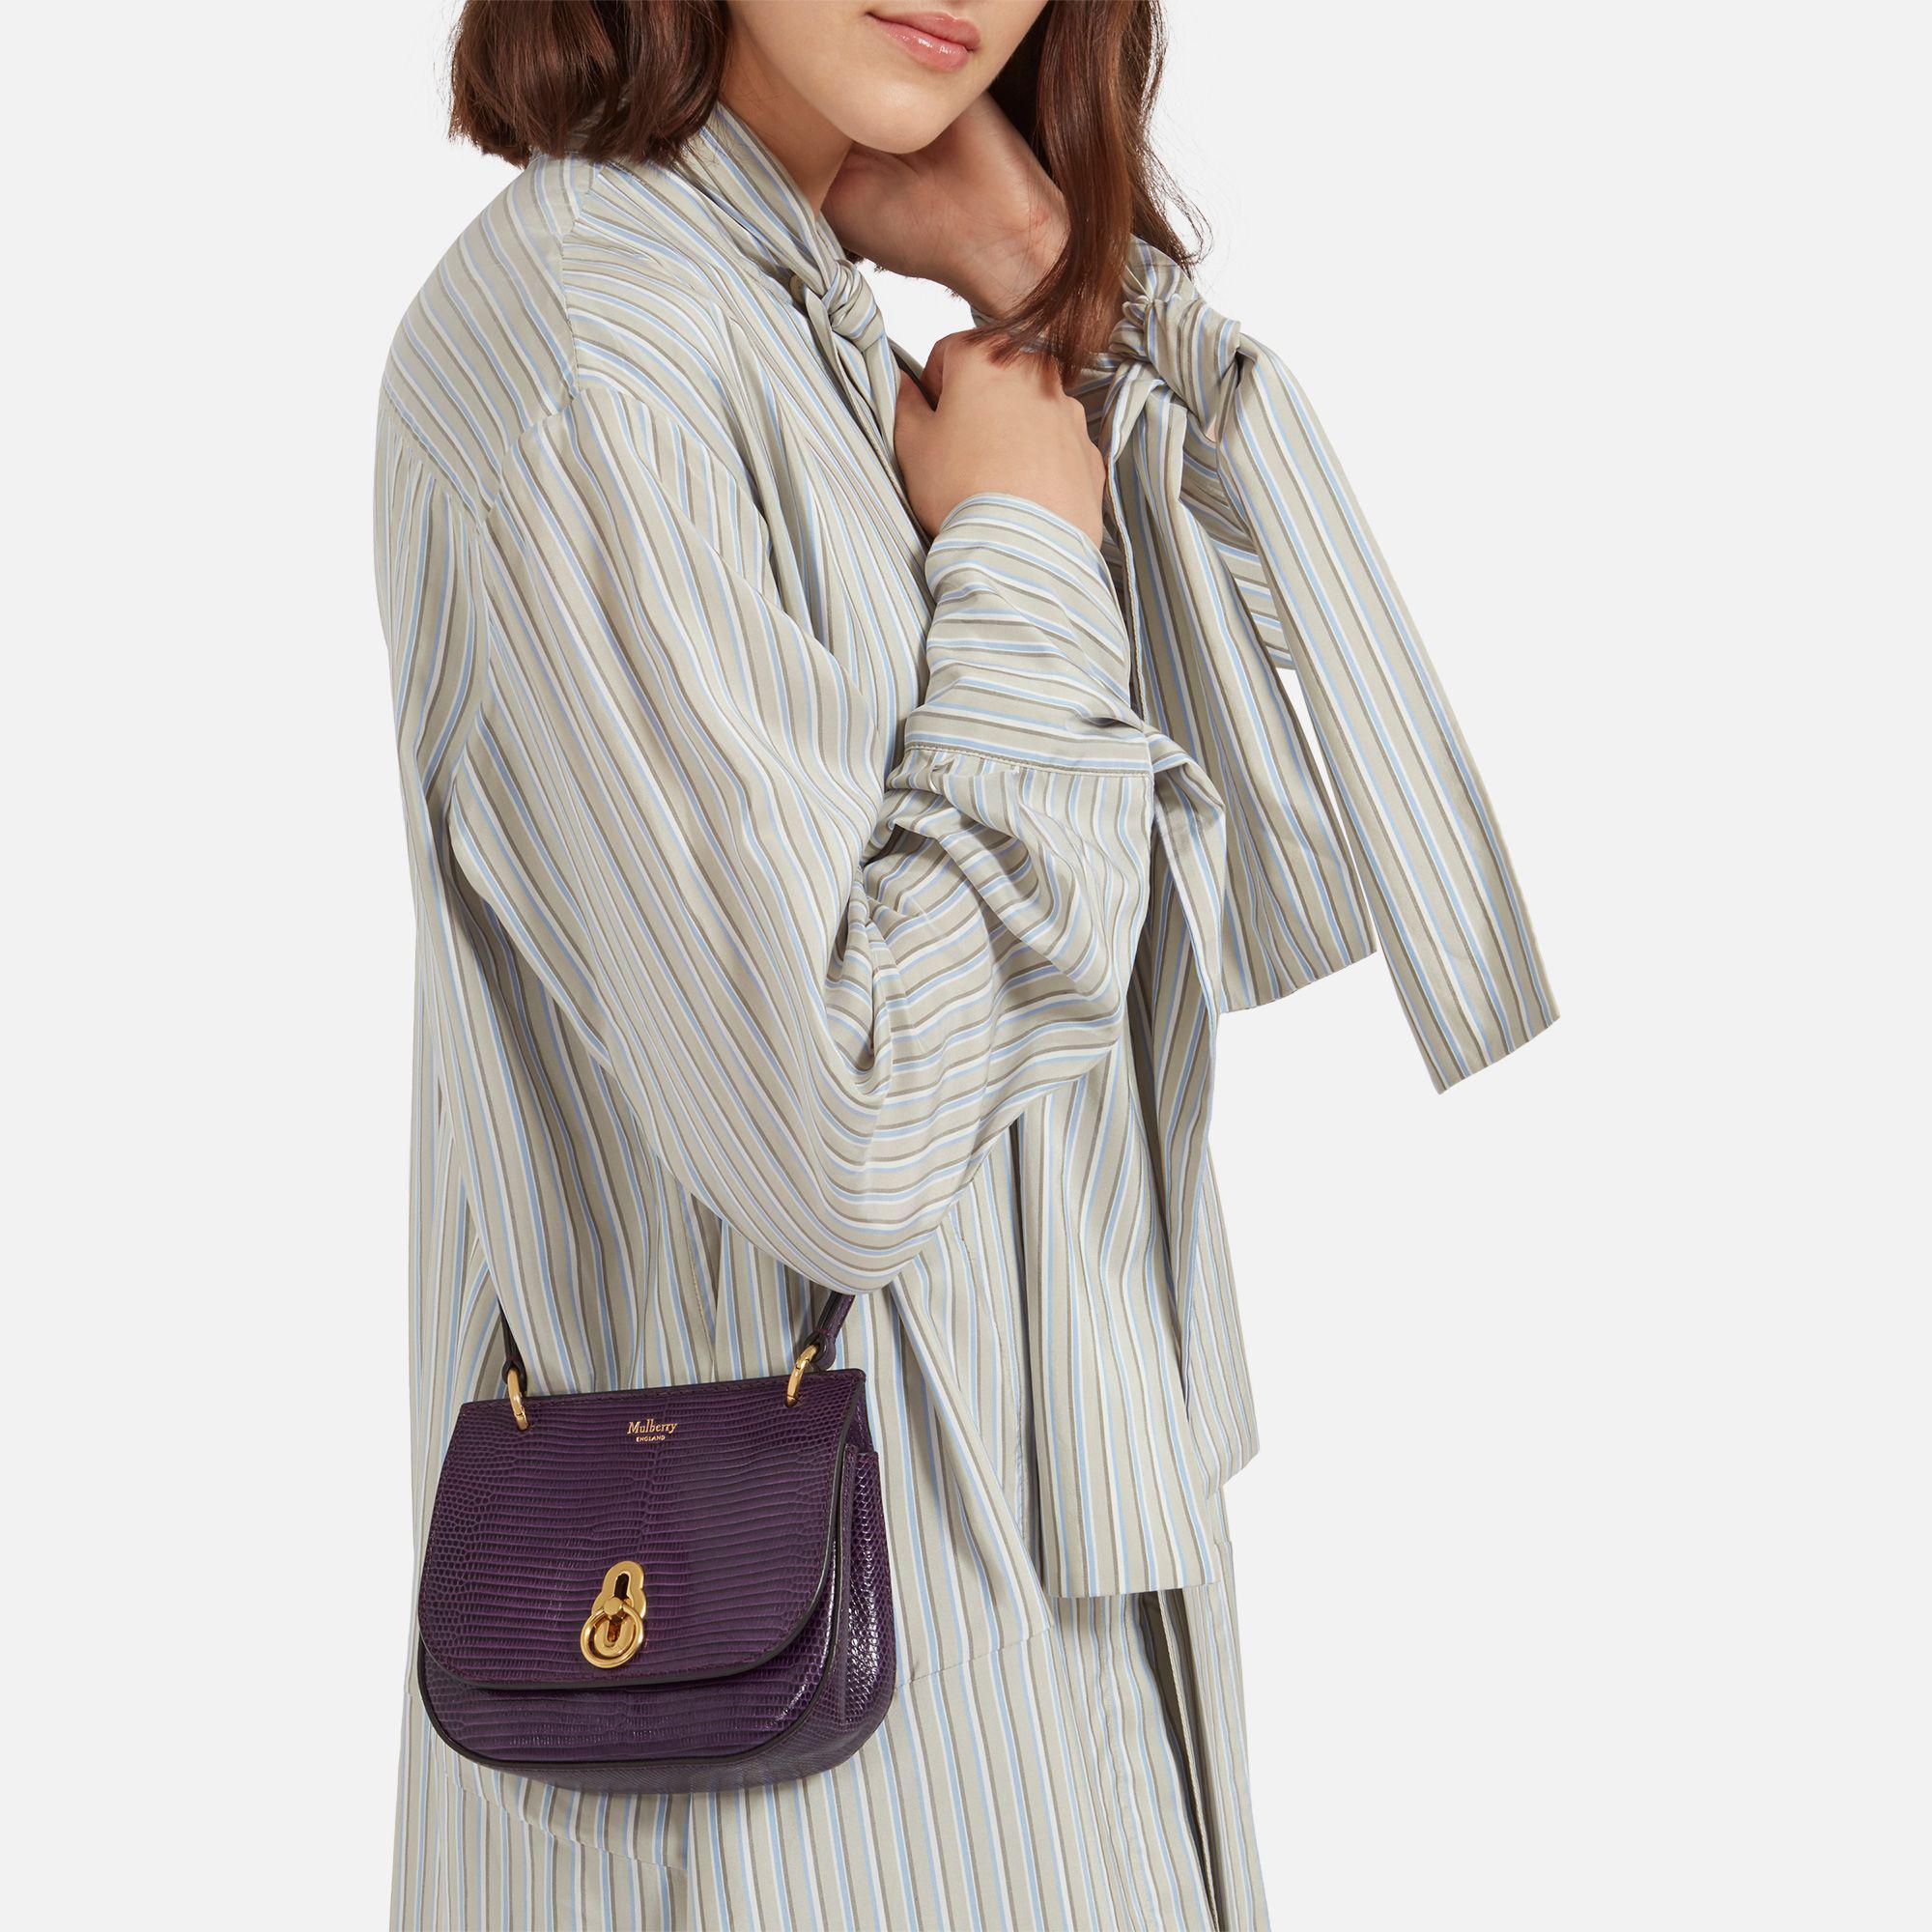 706009b7b411 ... discount amberley. mulberry handbagequestrian mulberry purple mini amberley  satchel lyst. view fullscreen cf26a 3e2c4